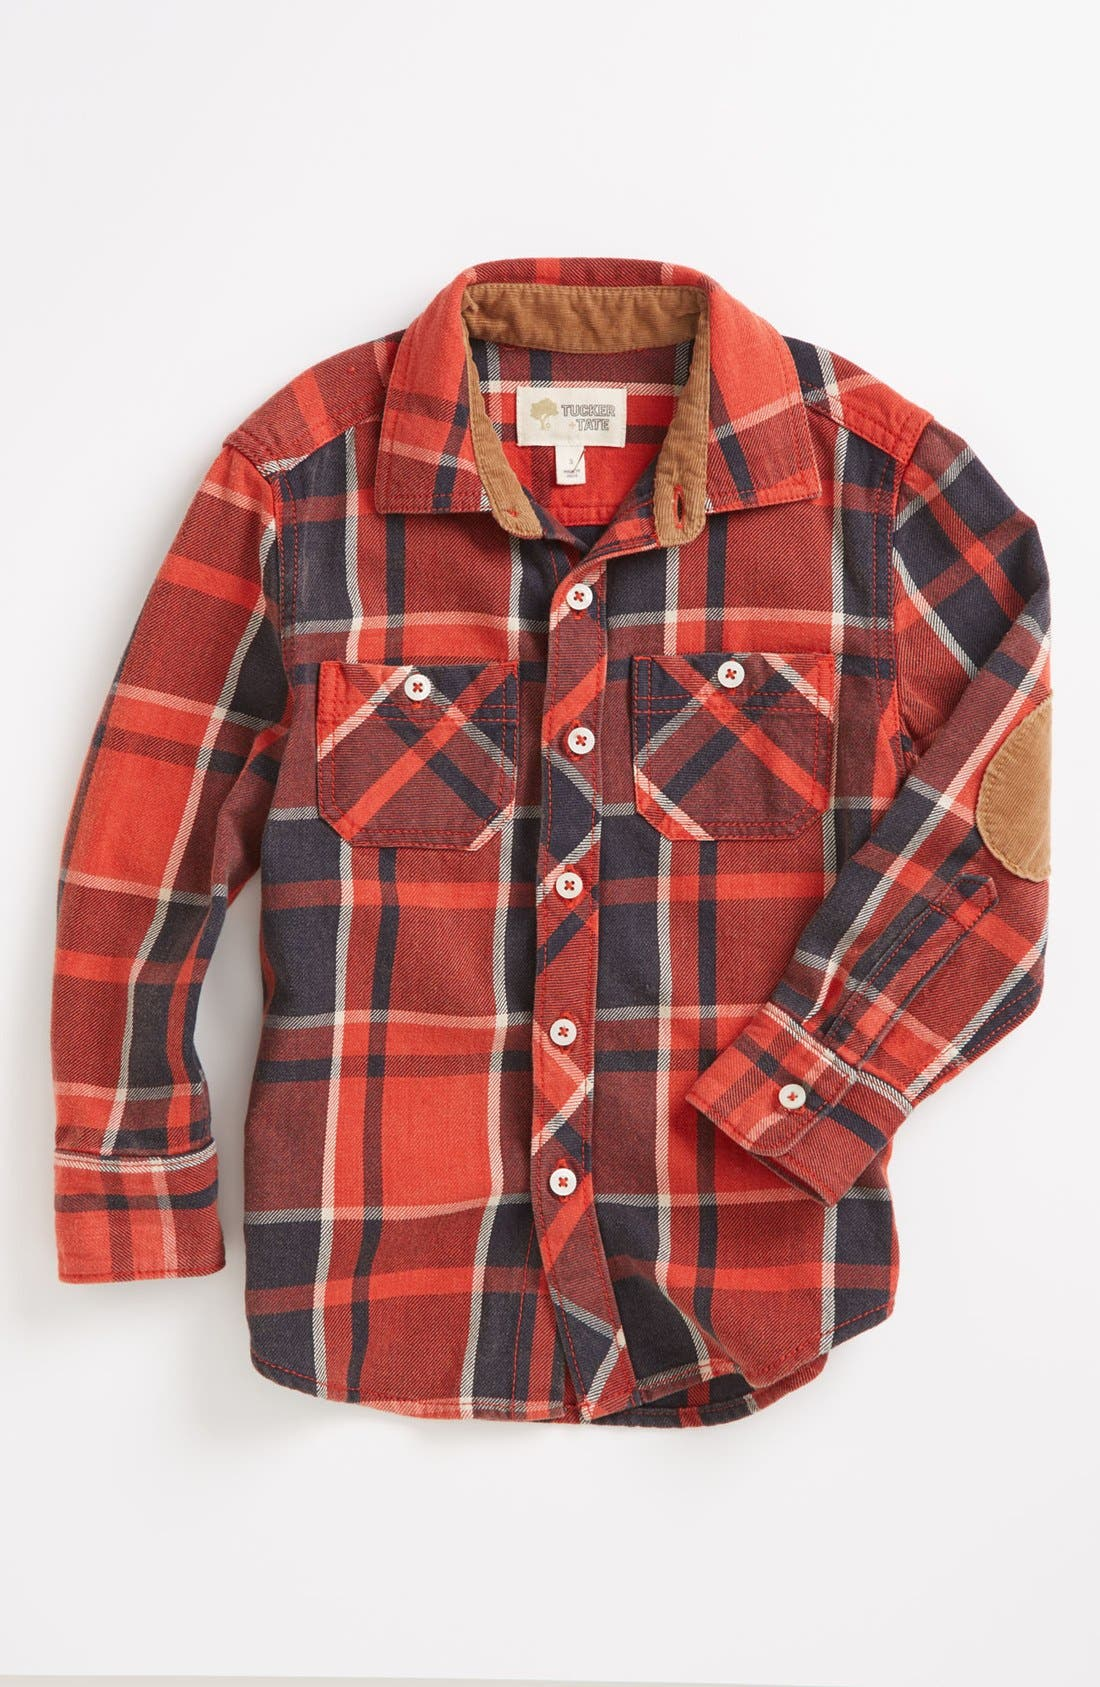 Alternate Image 1 Selected - Tucker + Tate 'Lawson' Shirt (Toddler Boys)